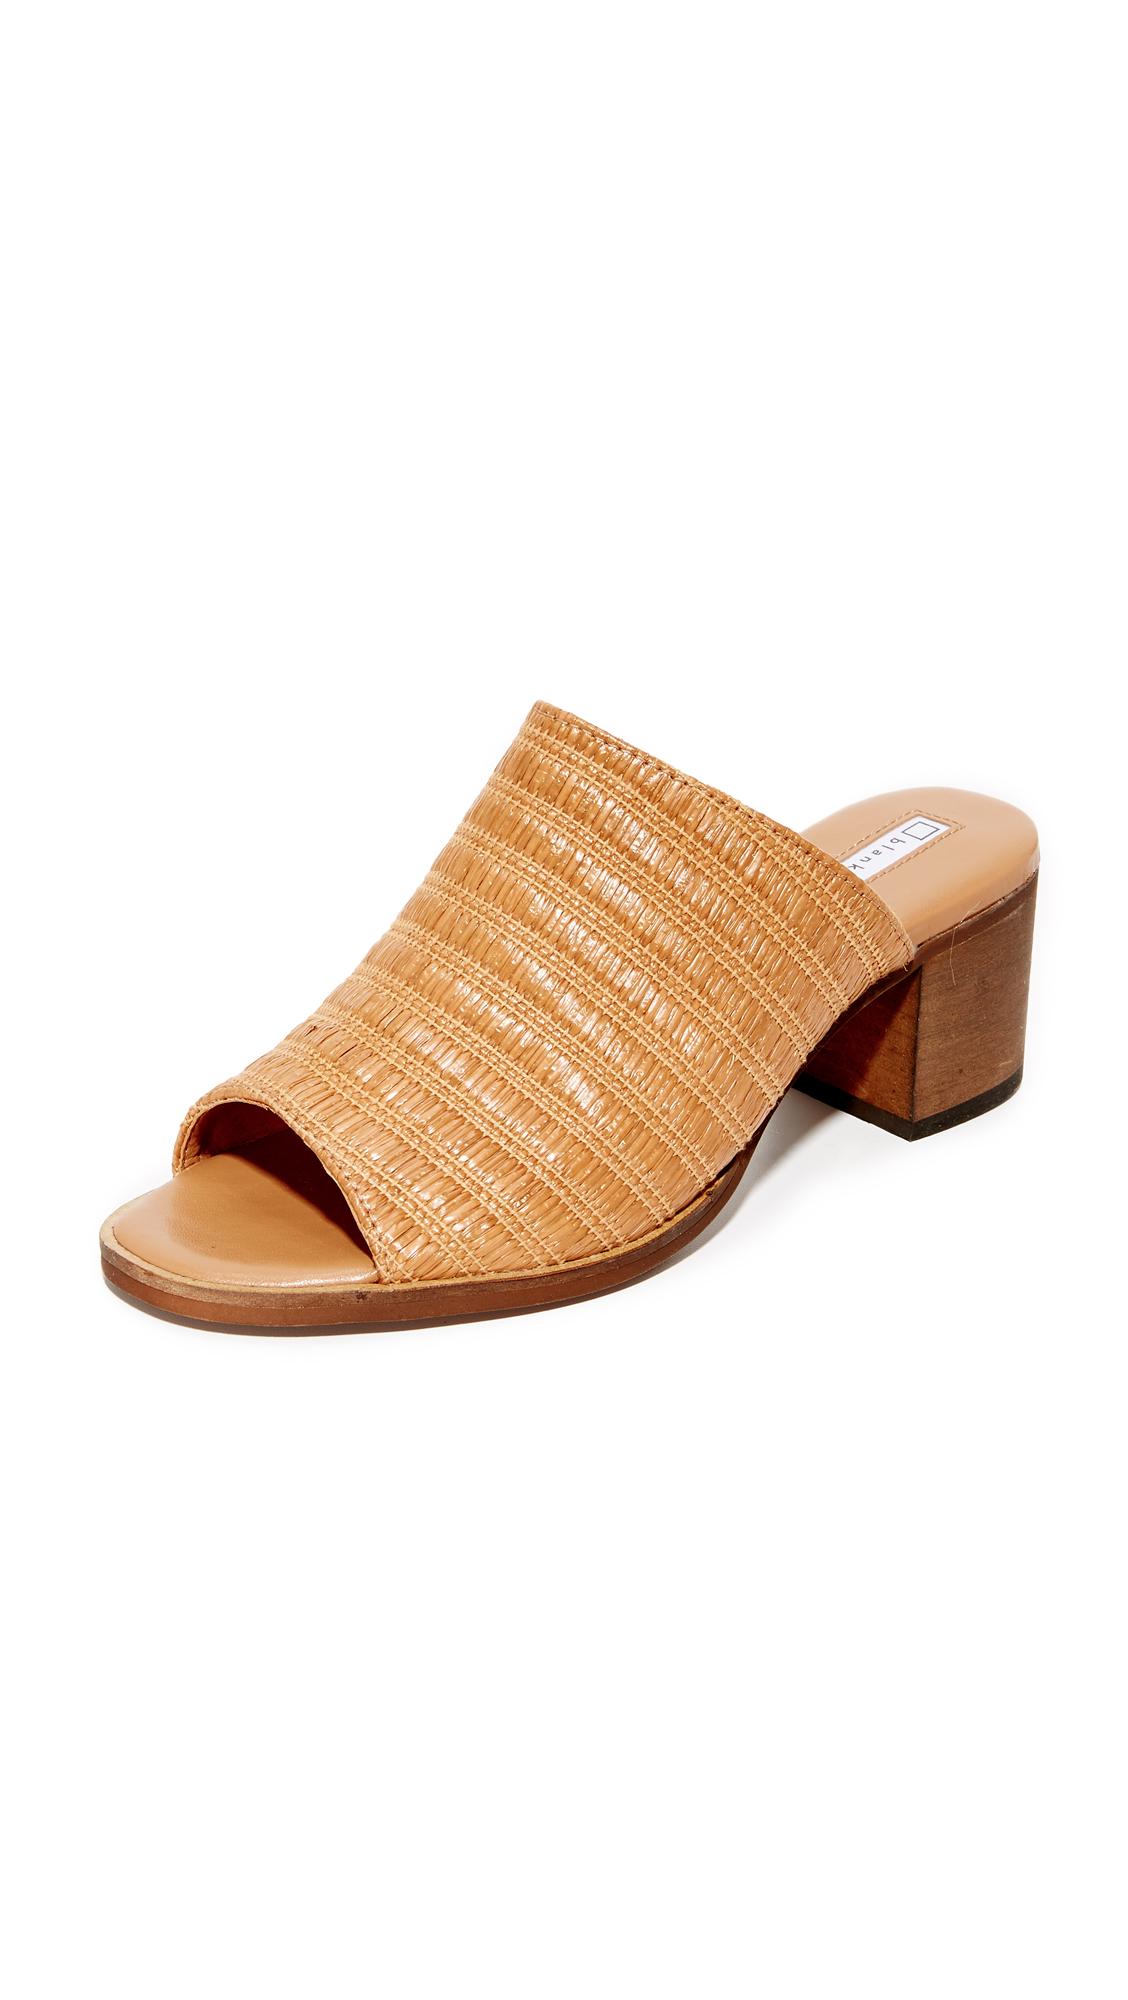 Blank Canvas Raffia City Mule Sandals - Camello at Shopbop